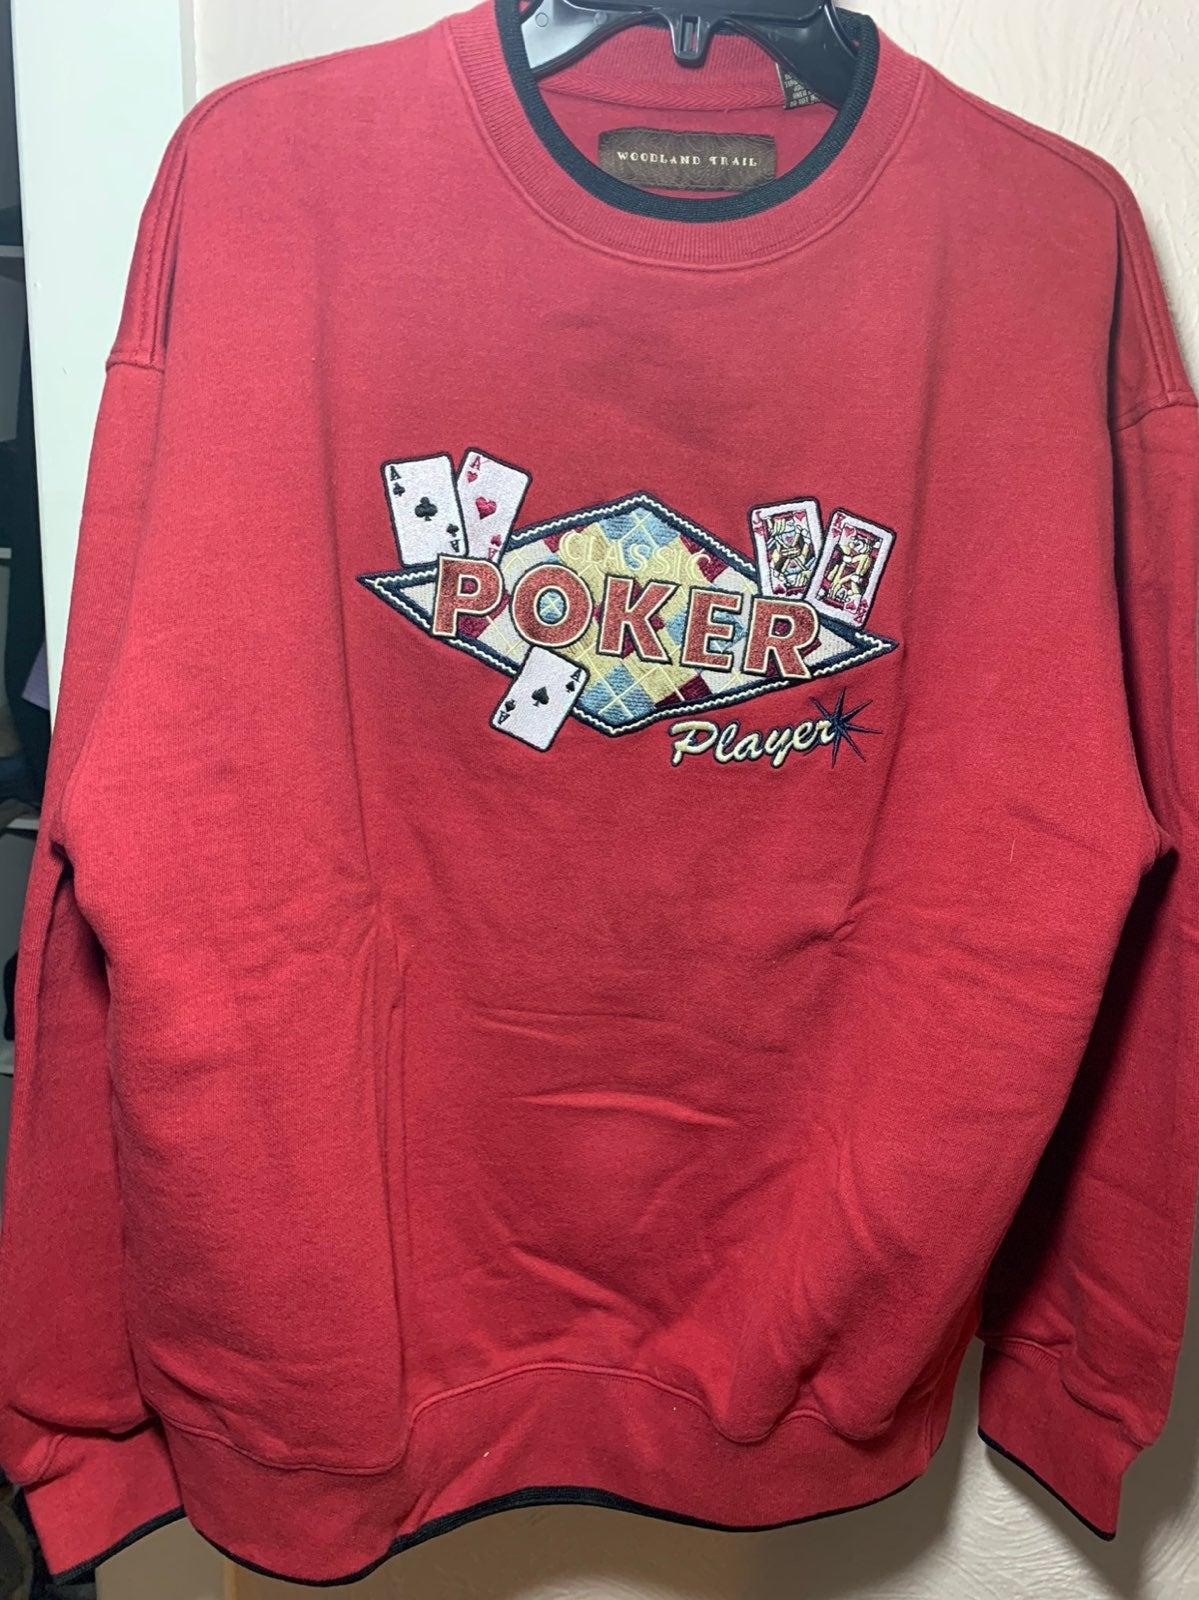 WOODLAND TRAIL Men's Sweatshirt